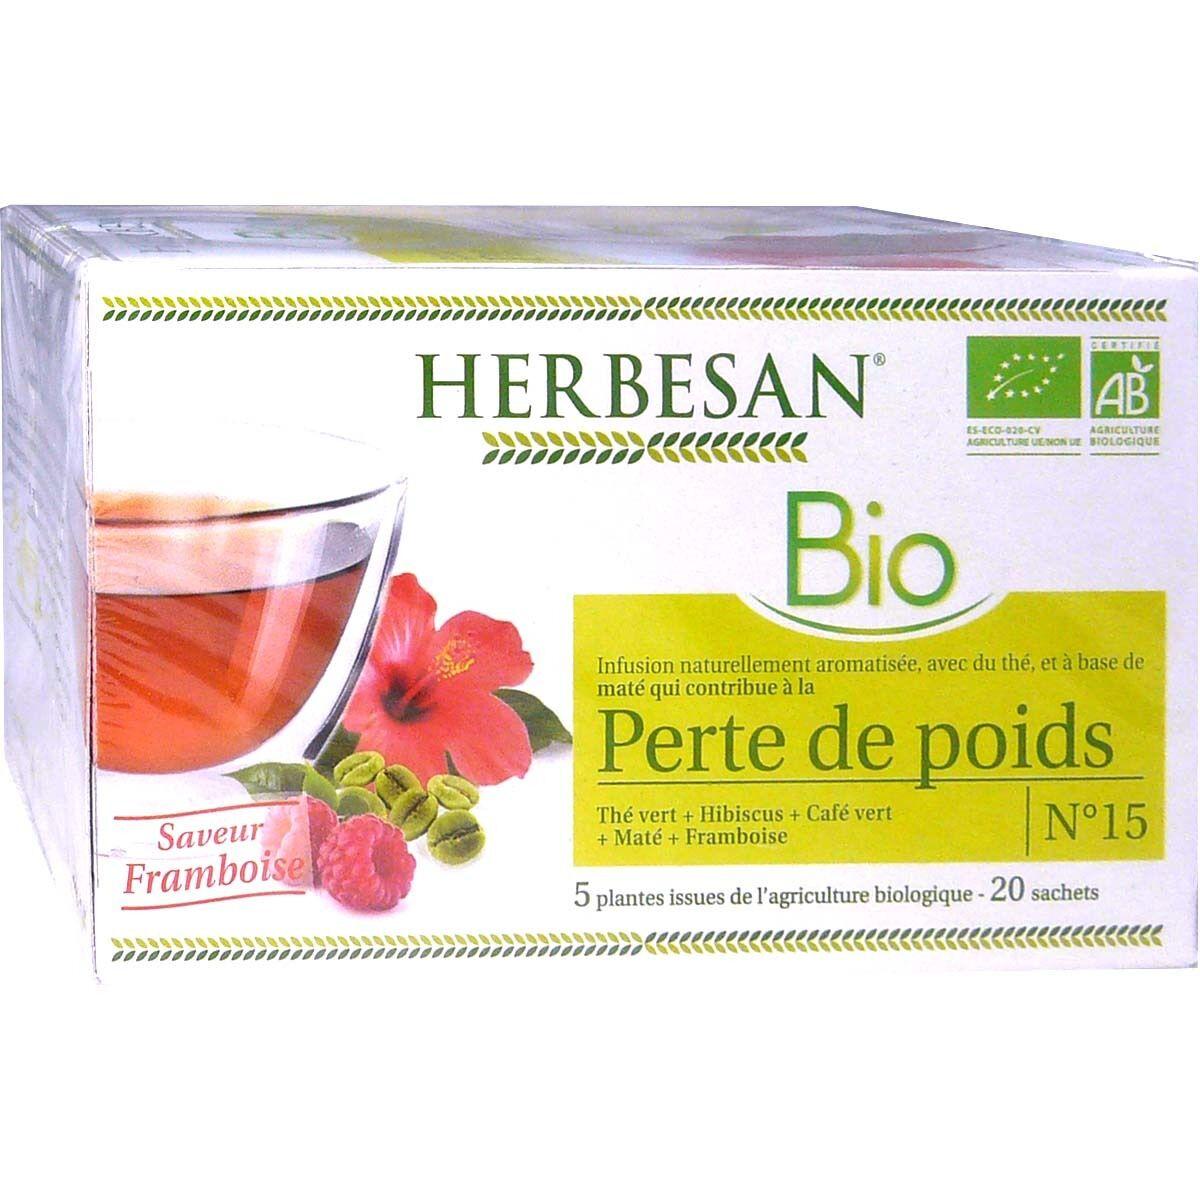 Herbesan infusion bio perte de poids gout framboise x20 sachets